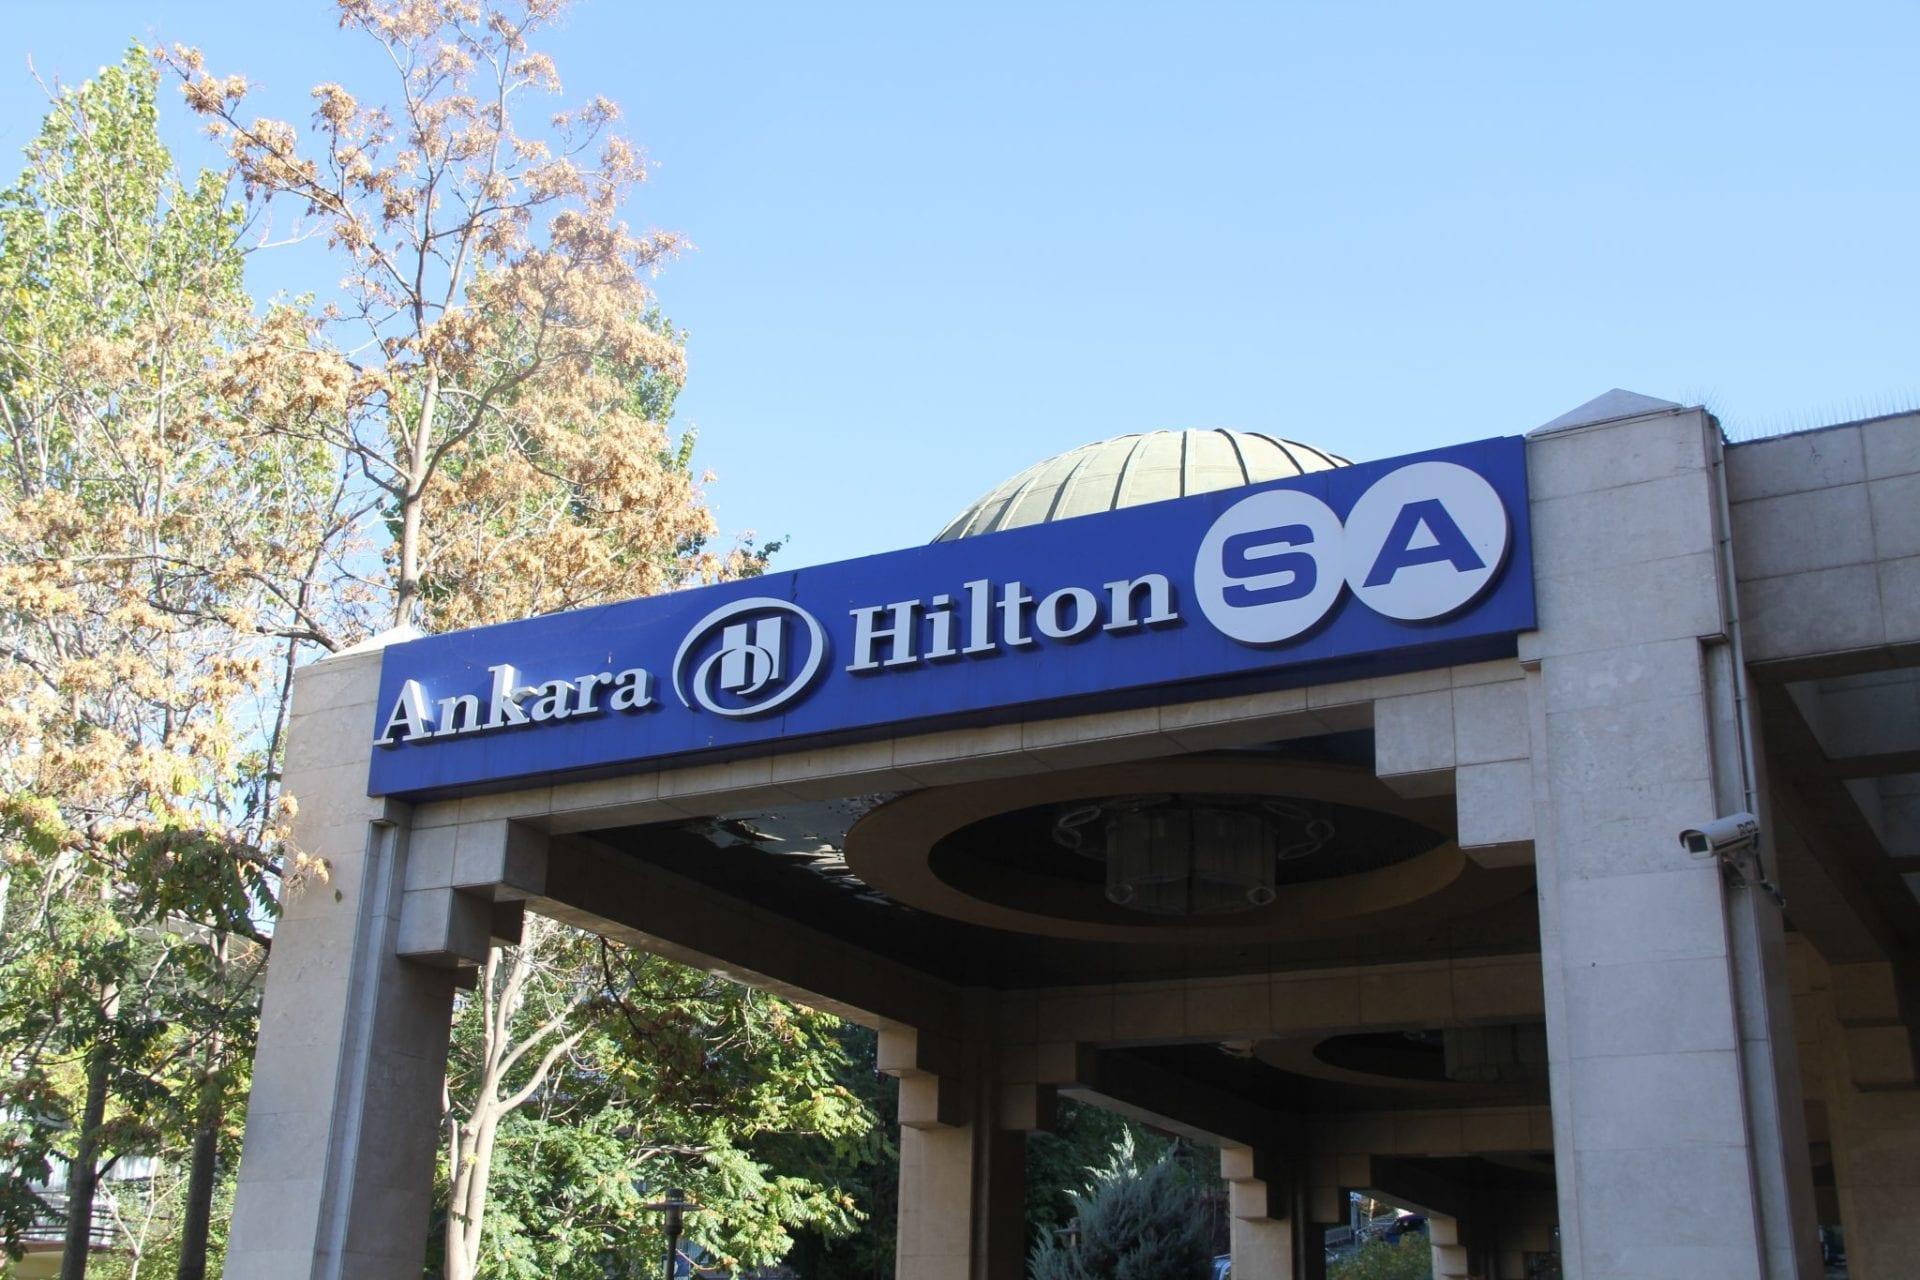 Flug Mit Hotel Nach Ankara